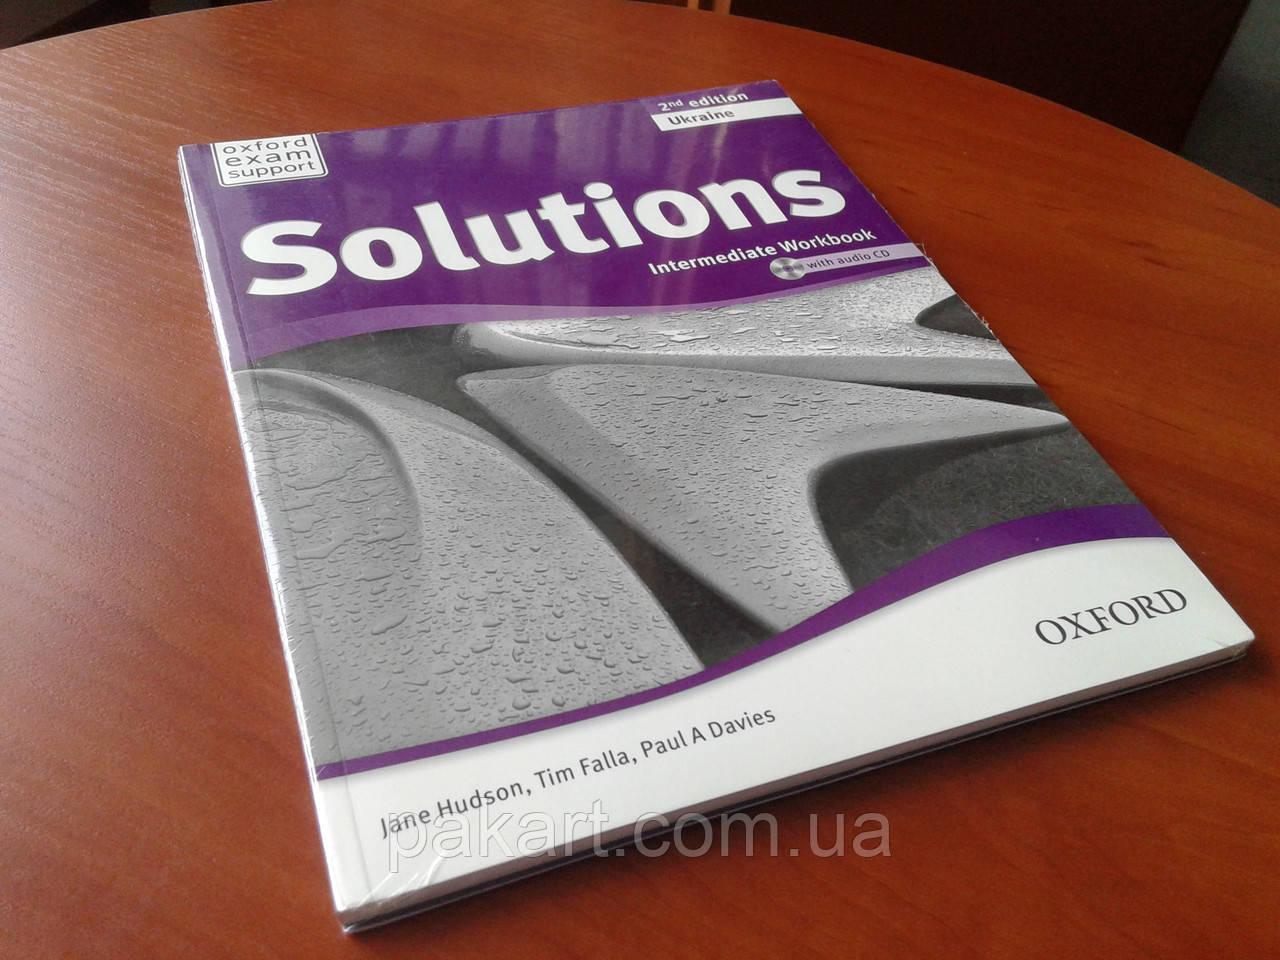 Услуги упаковки журналов, календарей в термоусадочную пленку